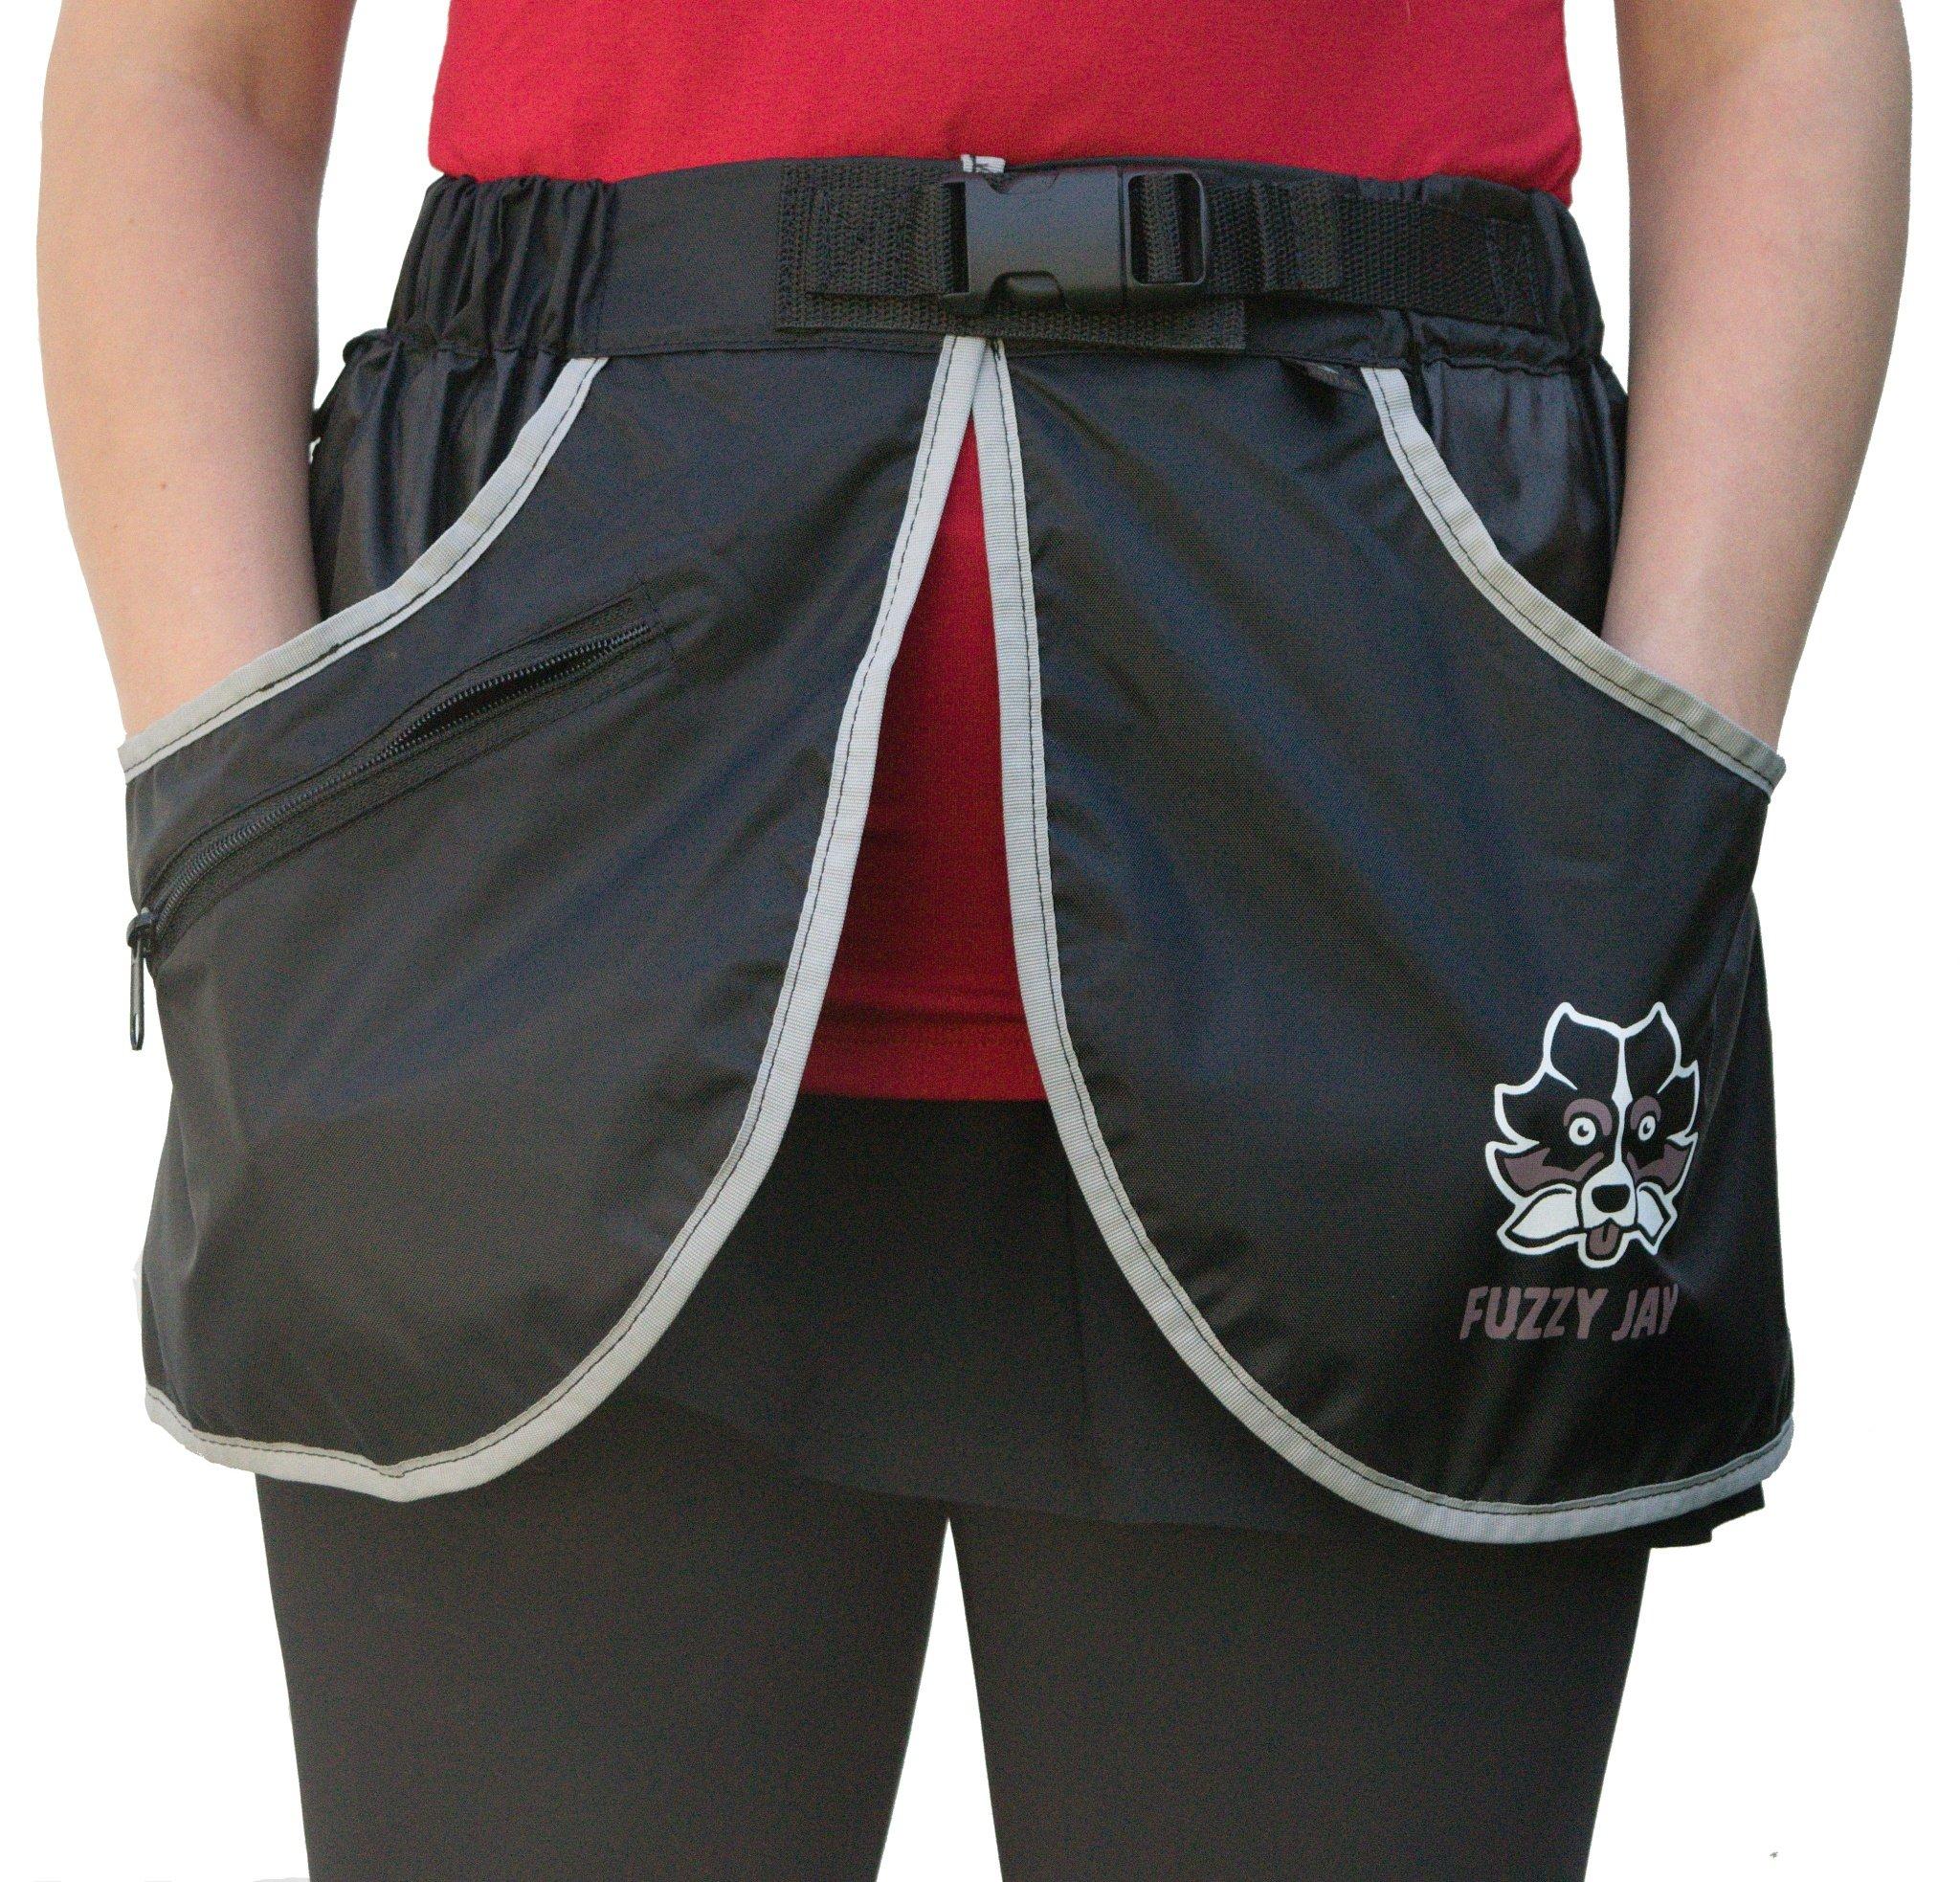 FUZZY JAY Agility Training Skirt (L/XL, Black/Grey)